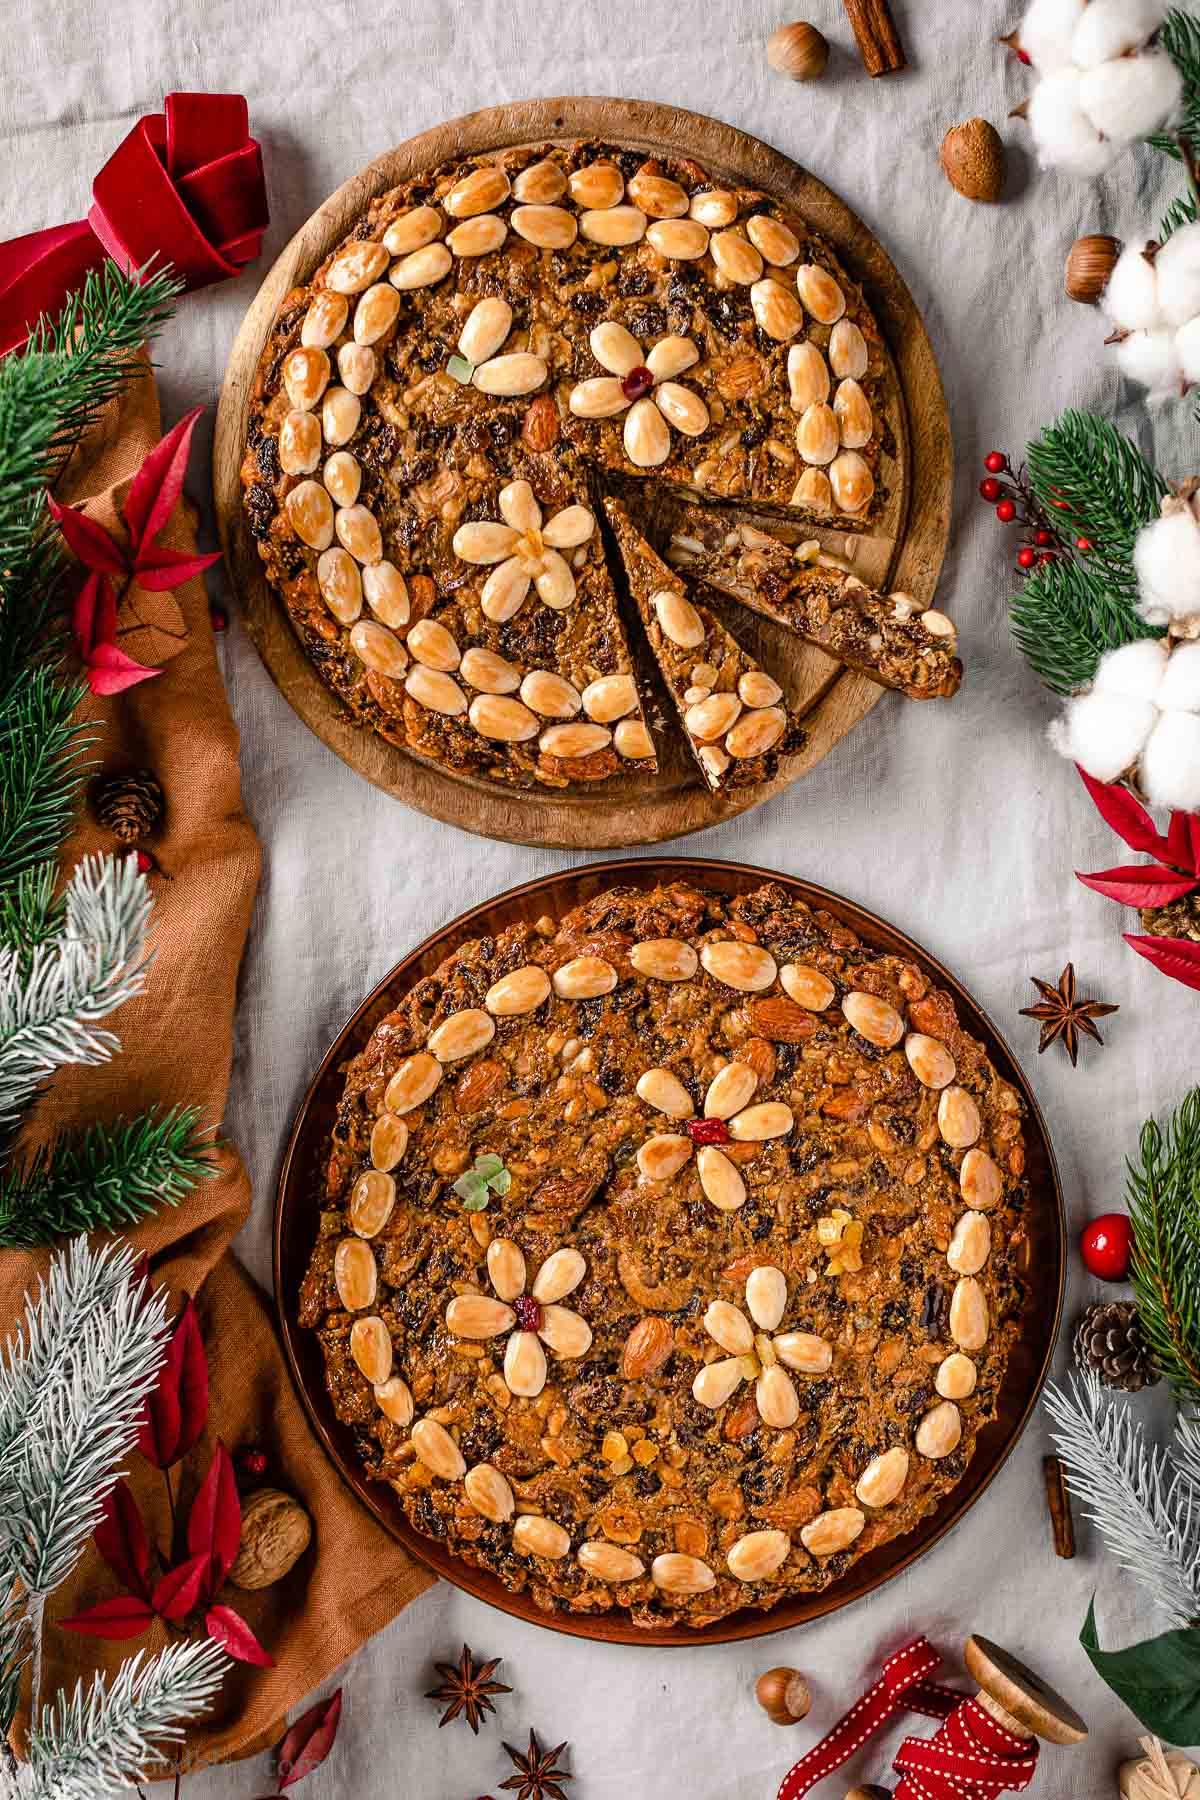 Ricetta Zelten Tirolese Originale Dolce di Natale del SudTirol vegan Christmas